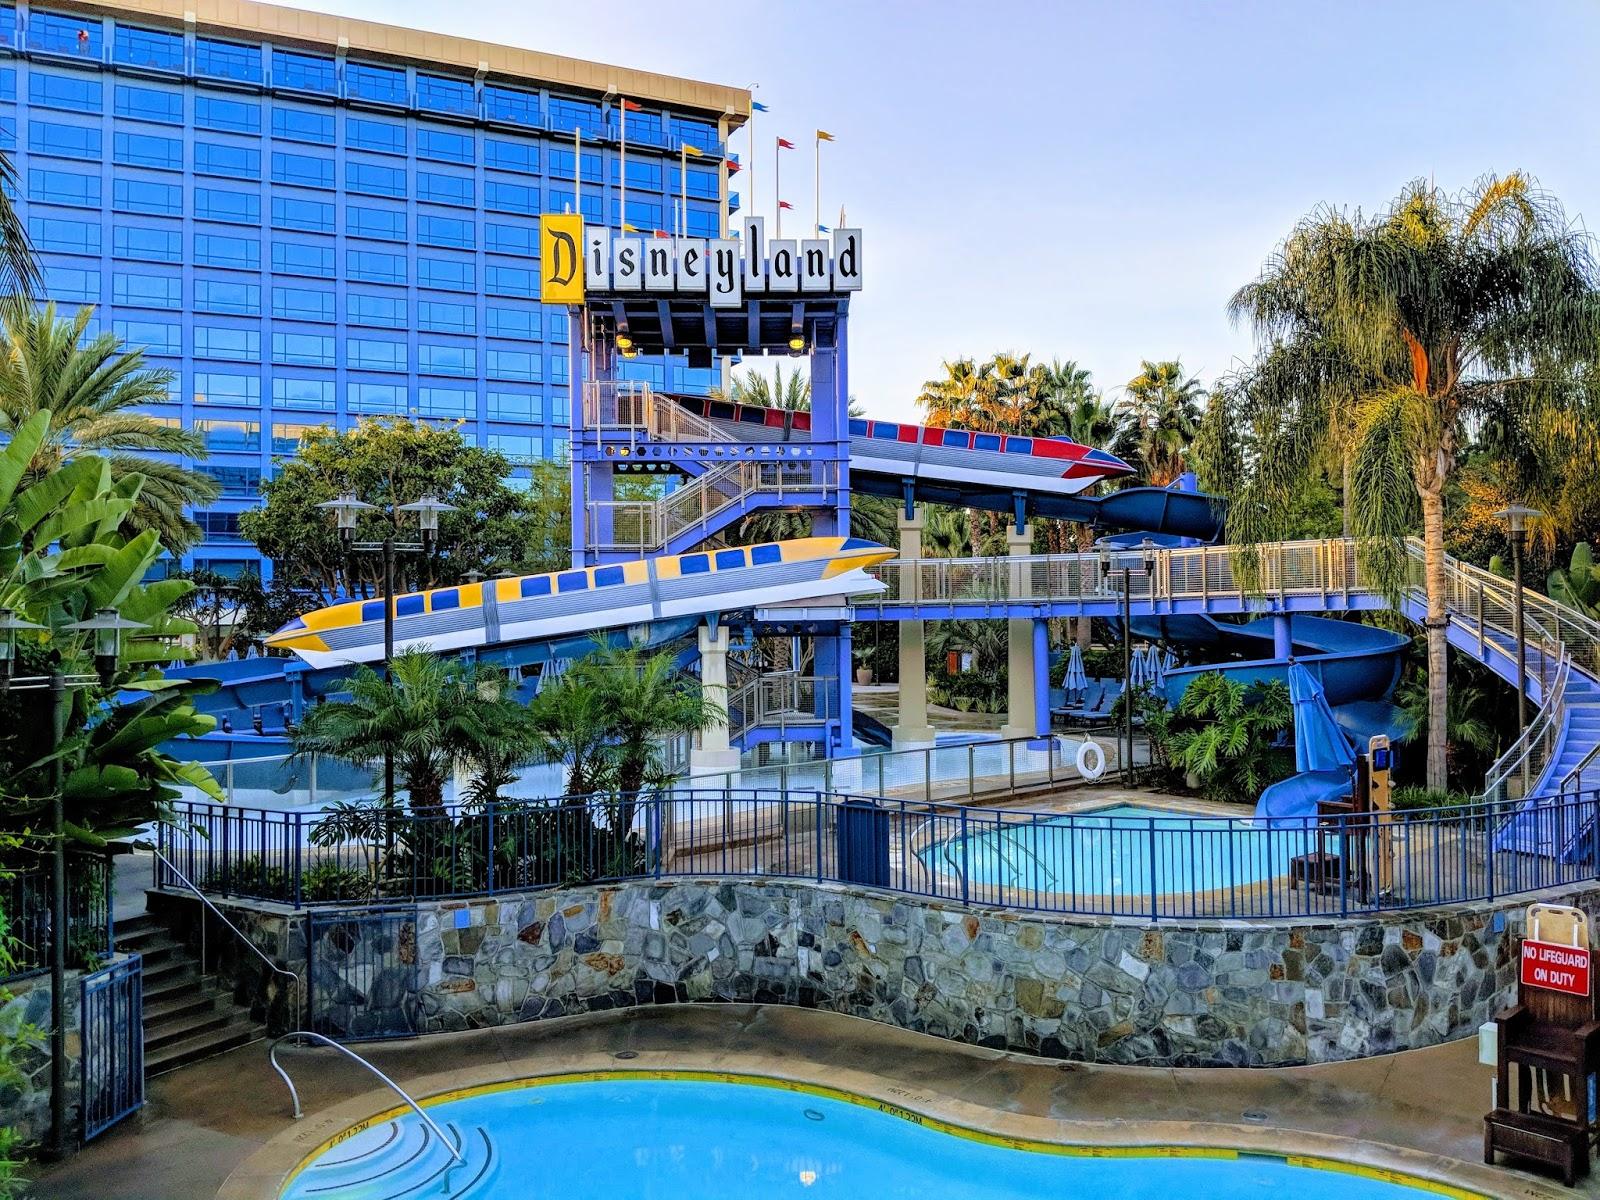 Review Disneyland Hotel